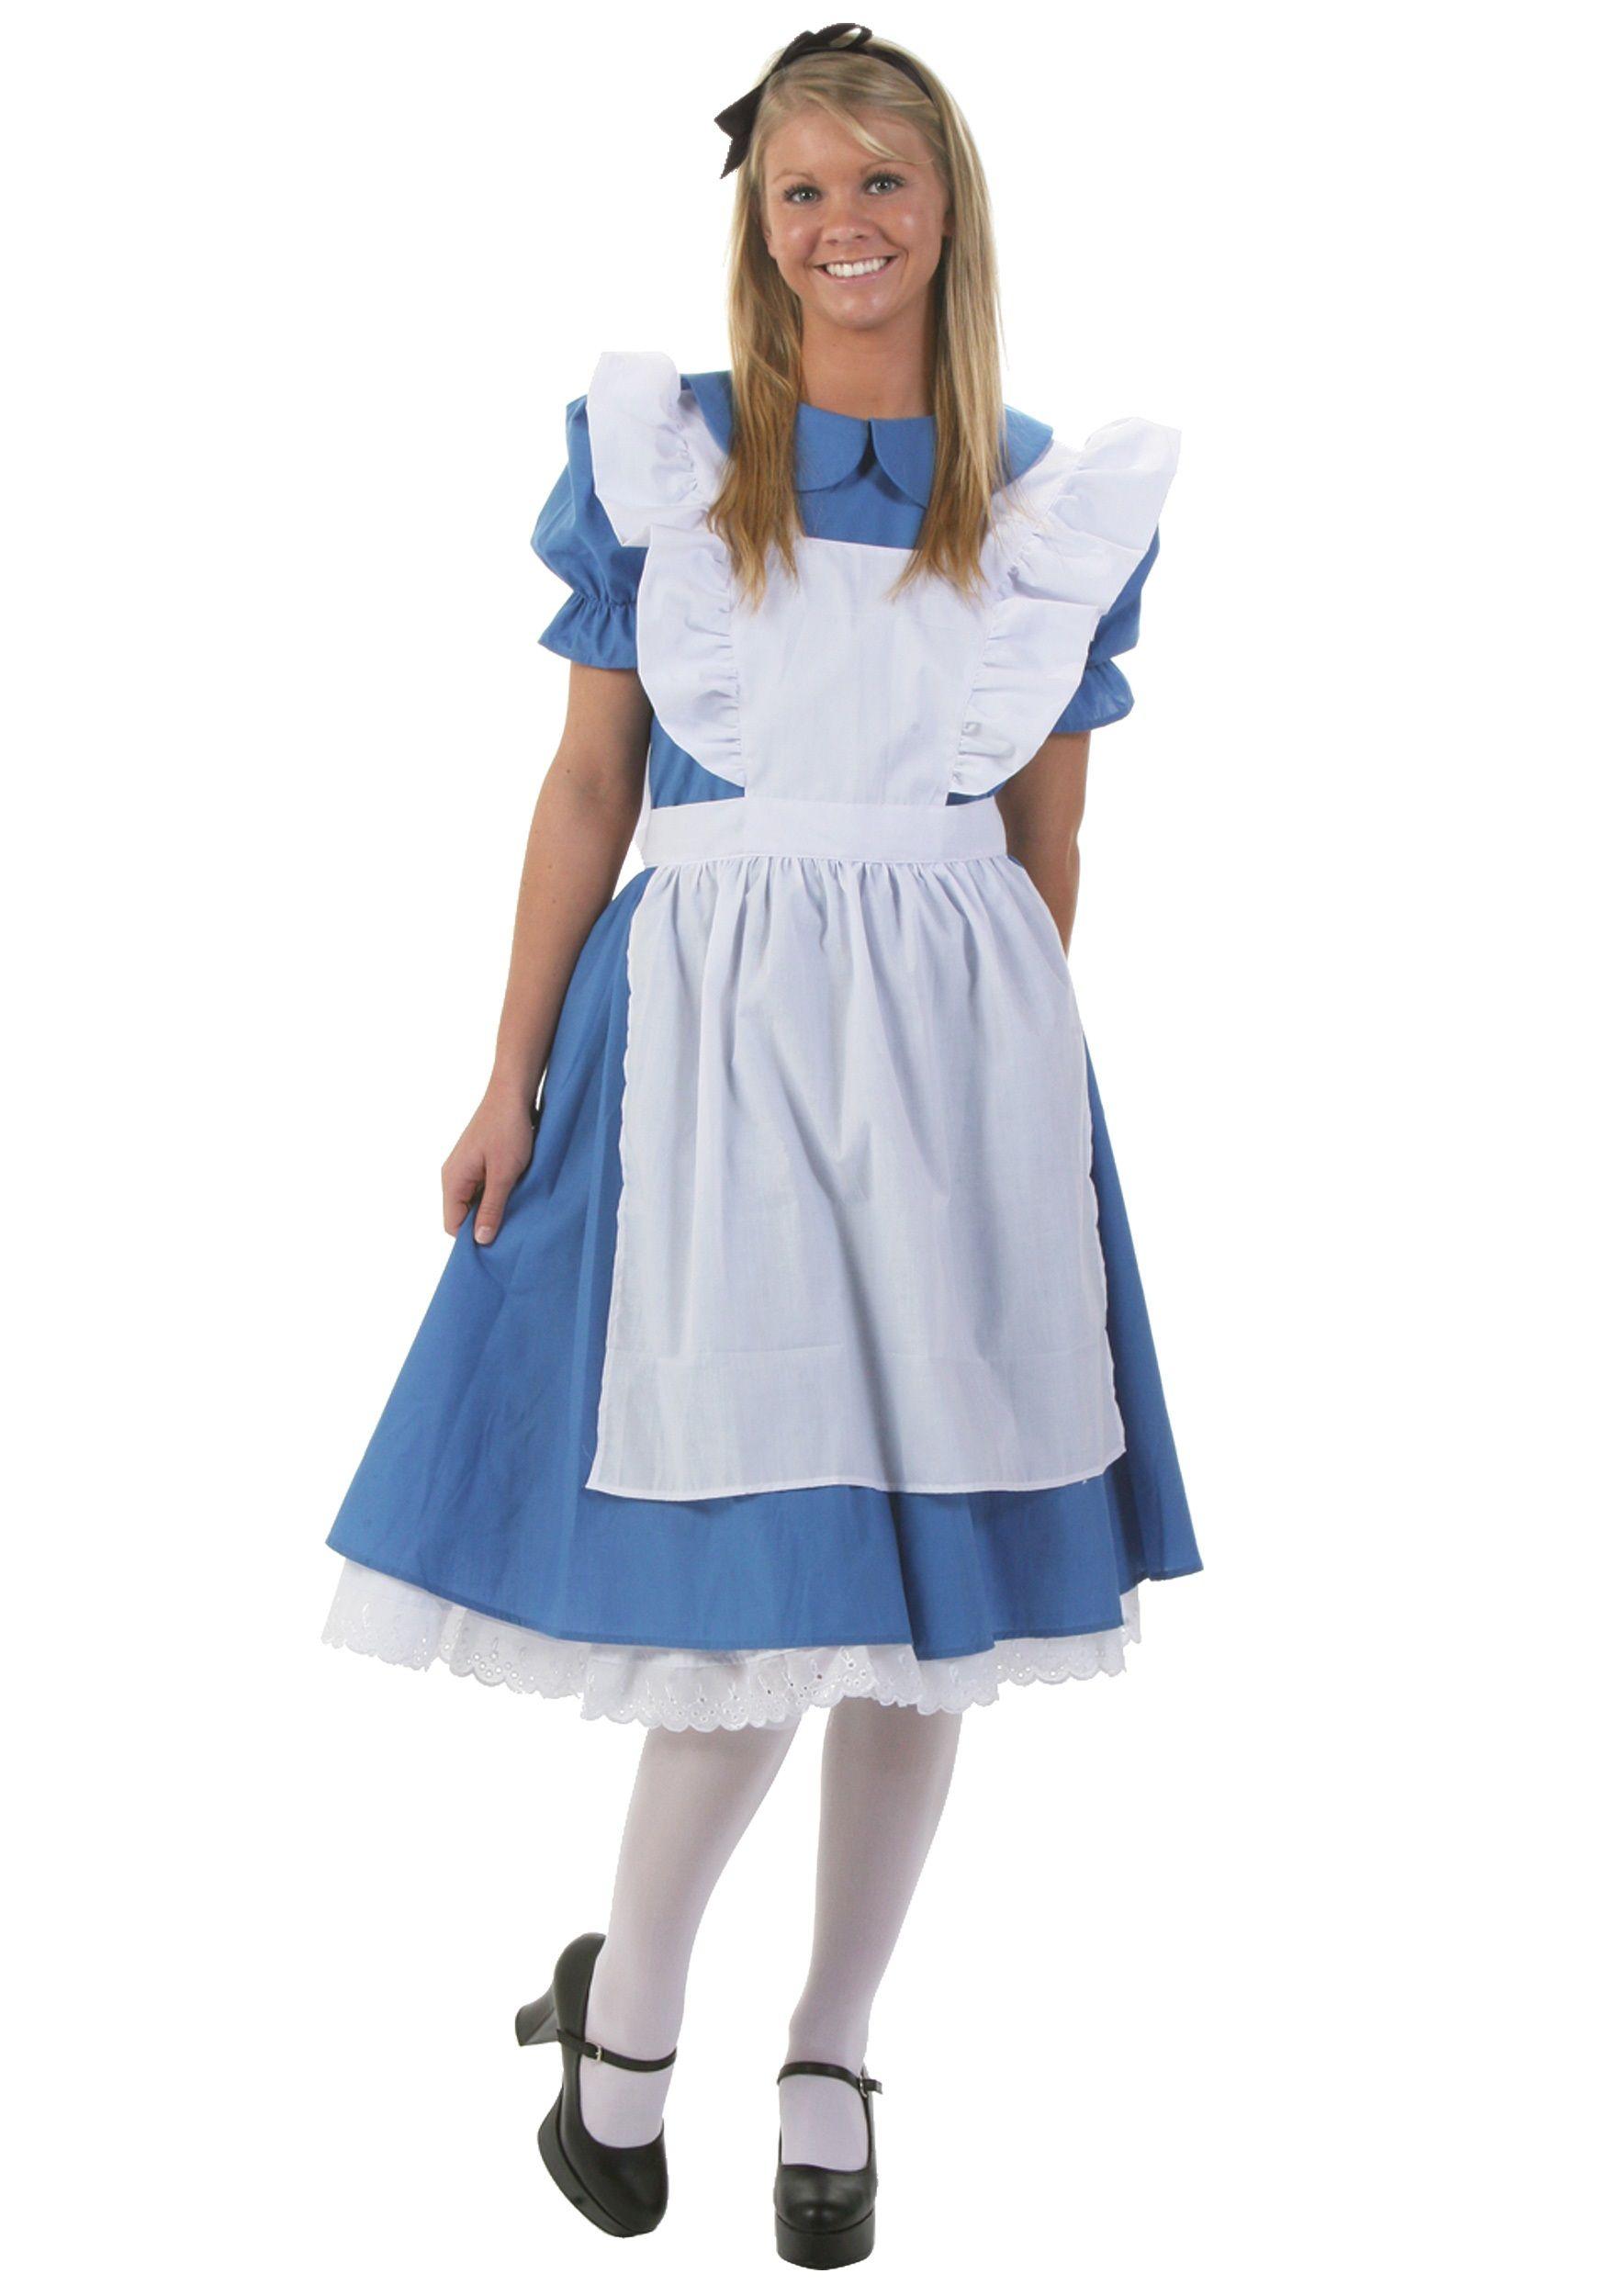 White apron alice wonderland costume - Adult Deluxe Alice Costume